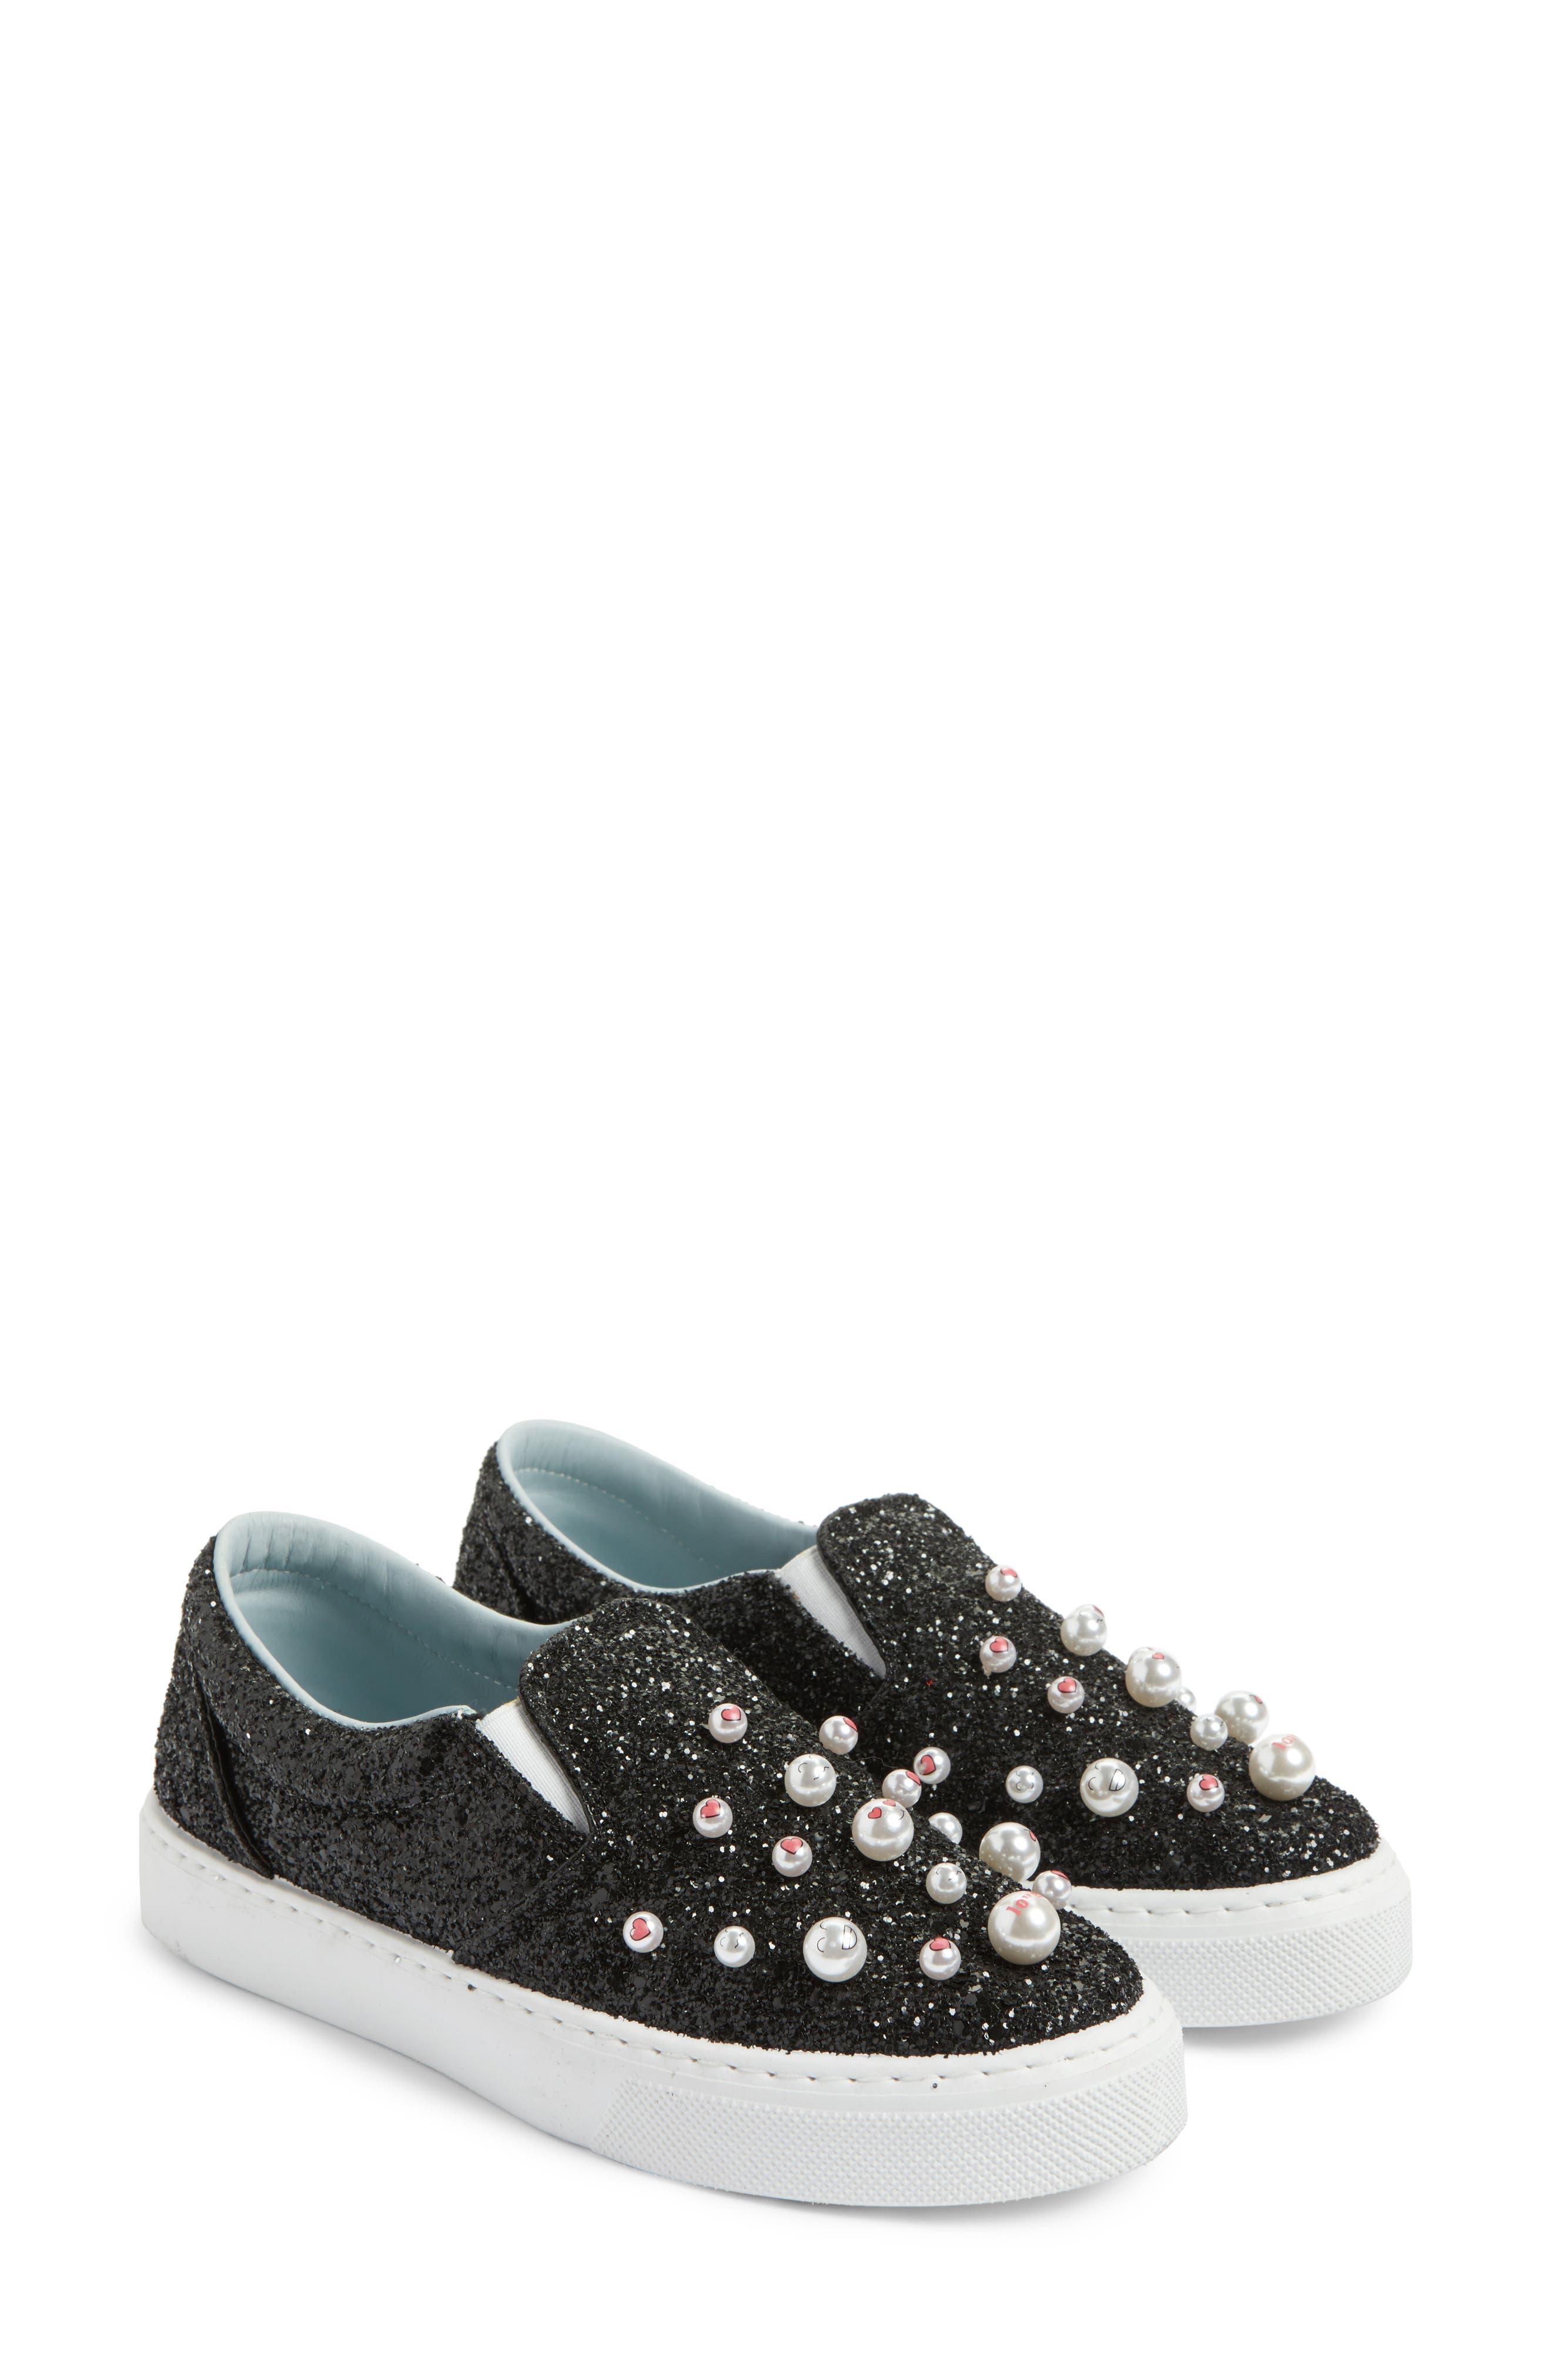 Candies Embellished Slip-On Sneaker,                         Main,                         color, 001